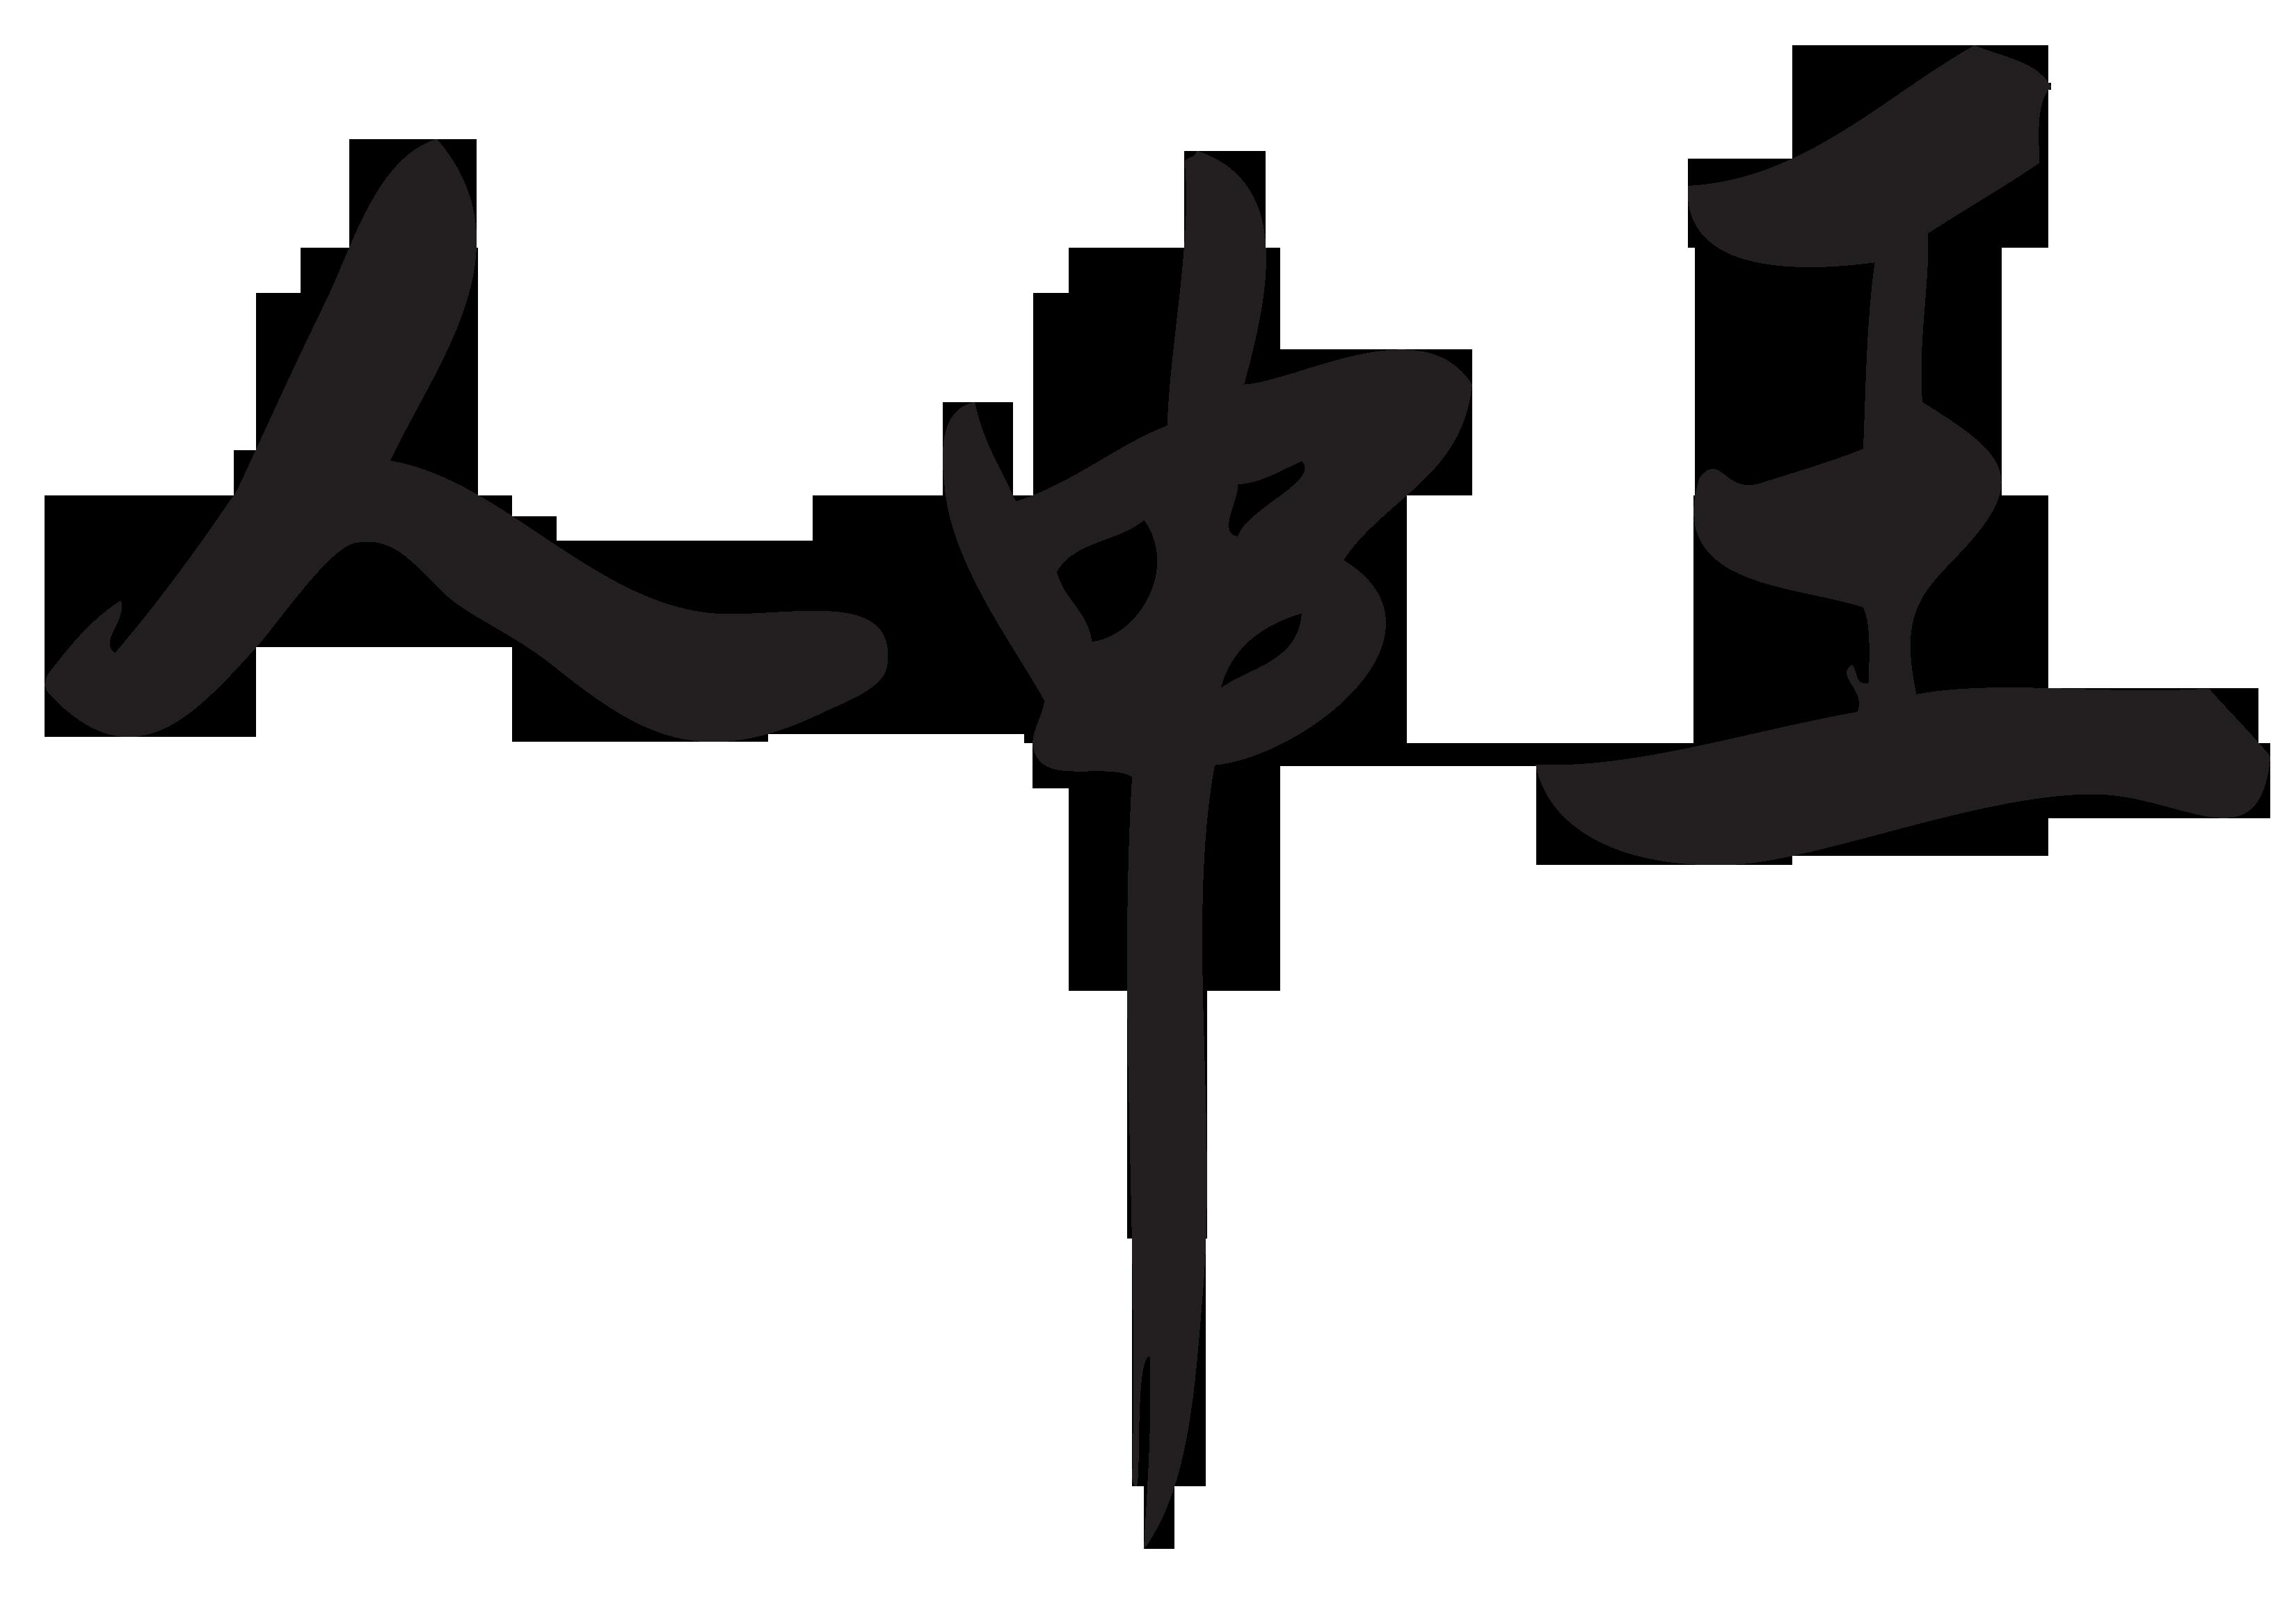 Assets-Kanji1